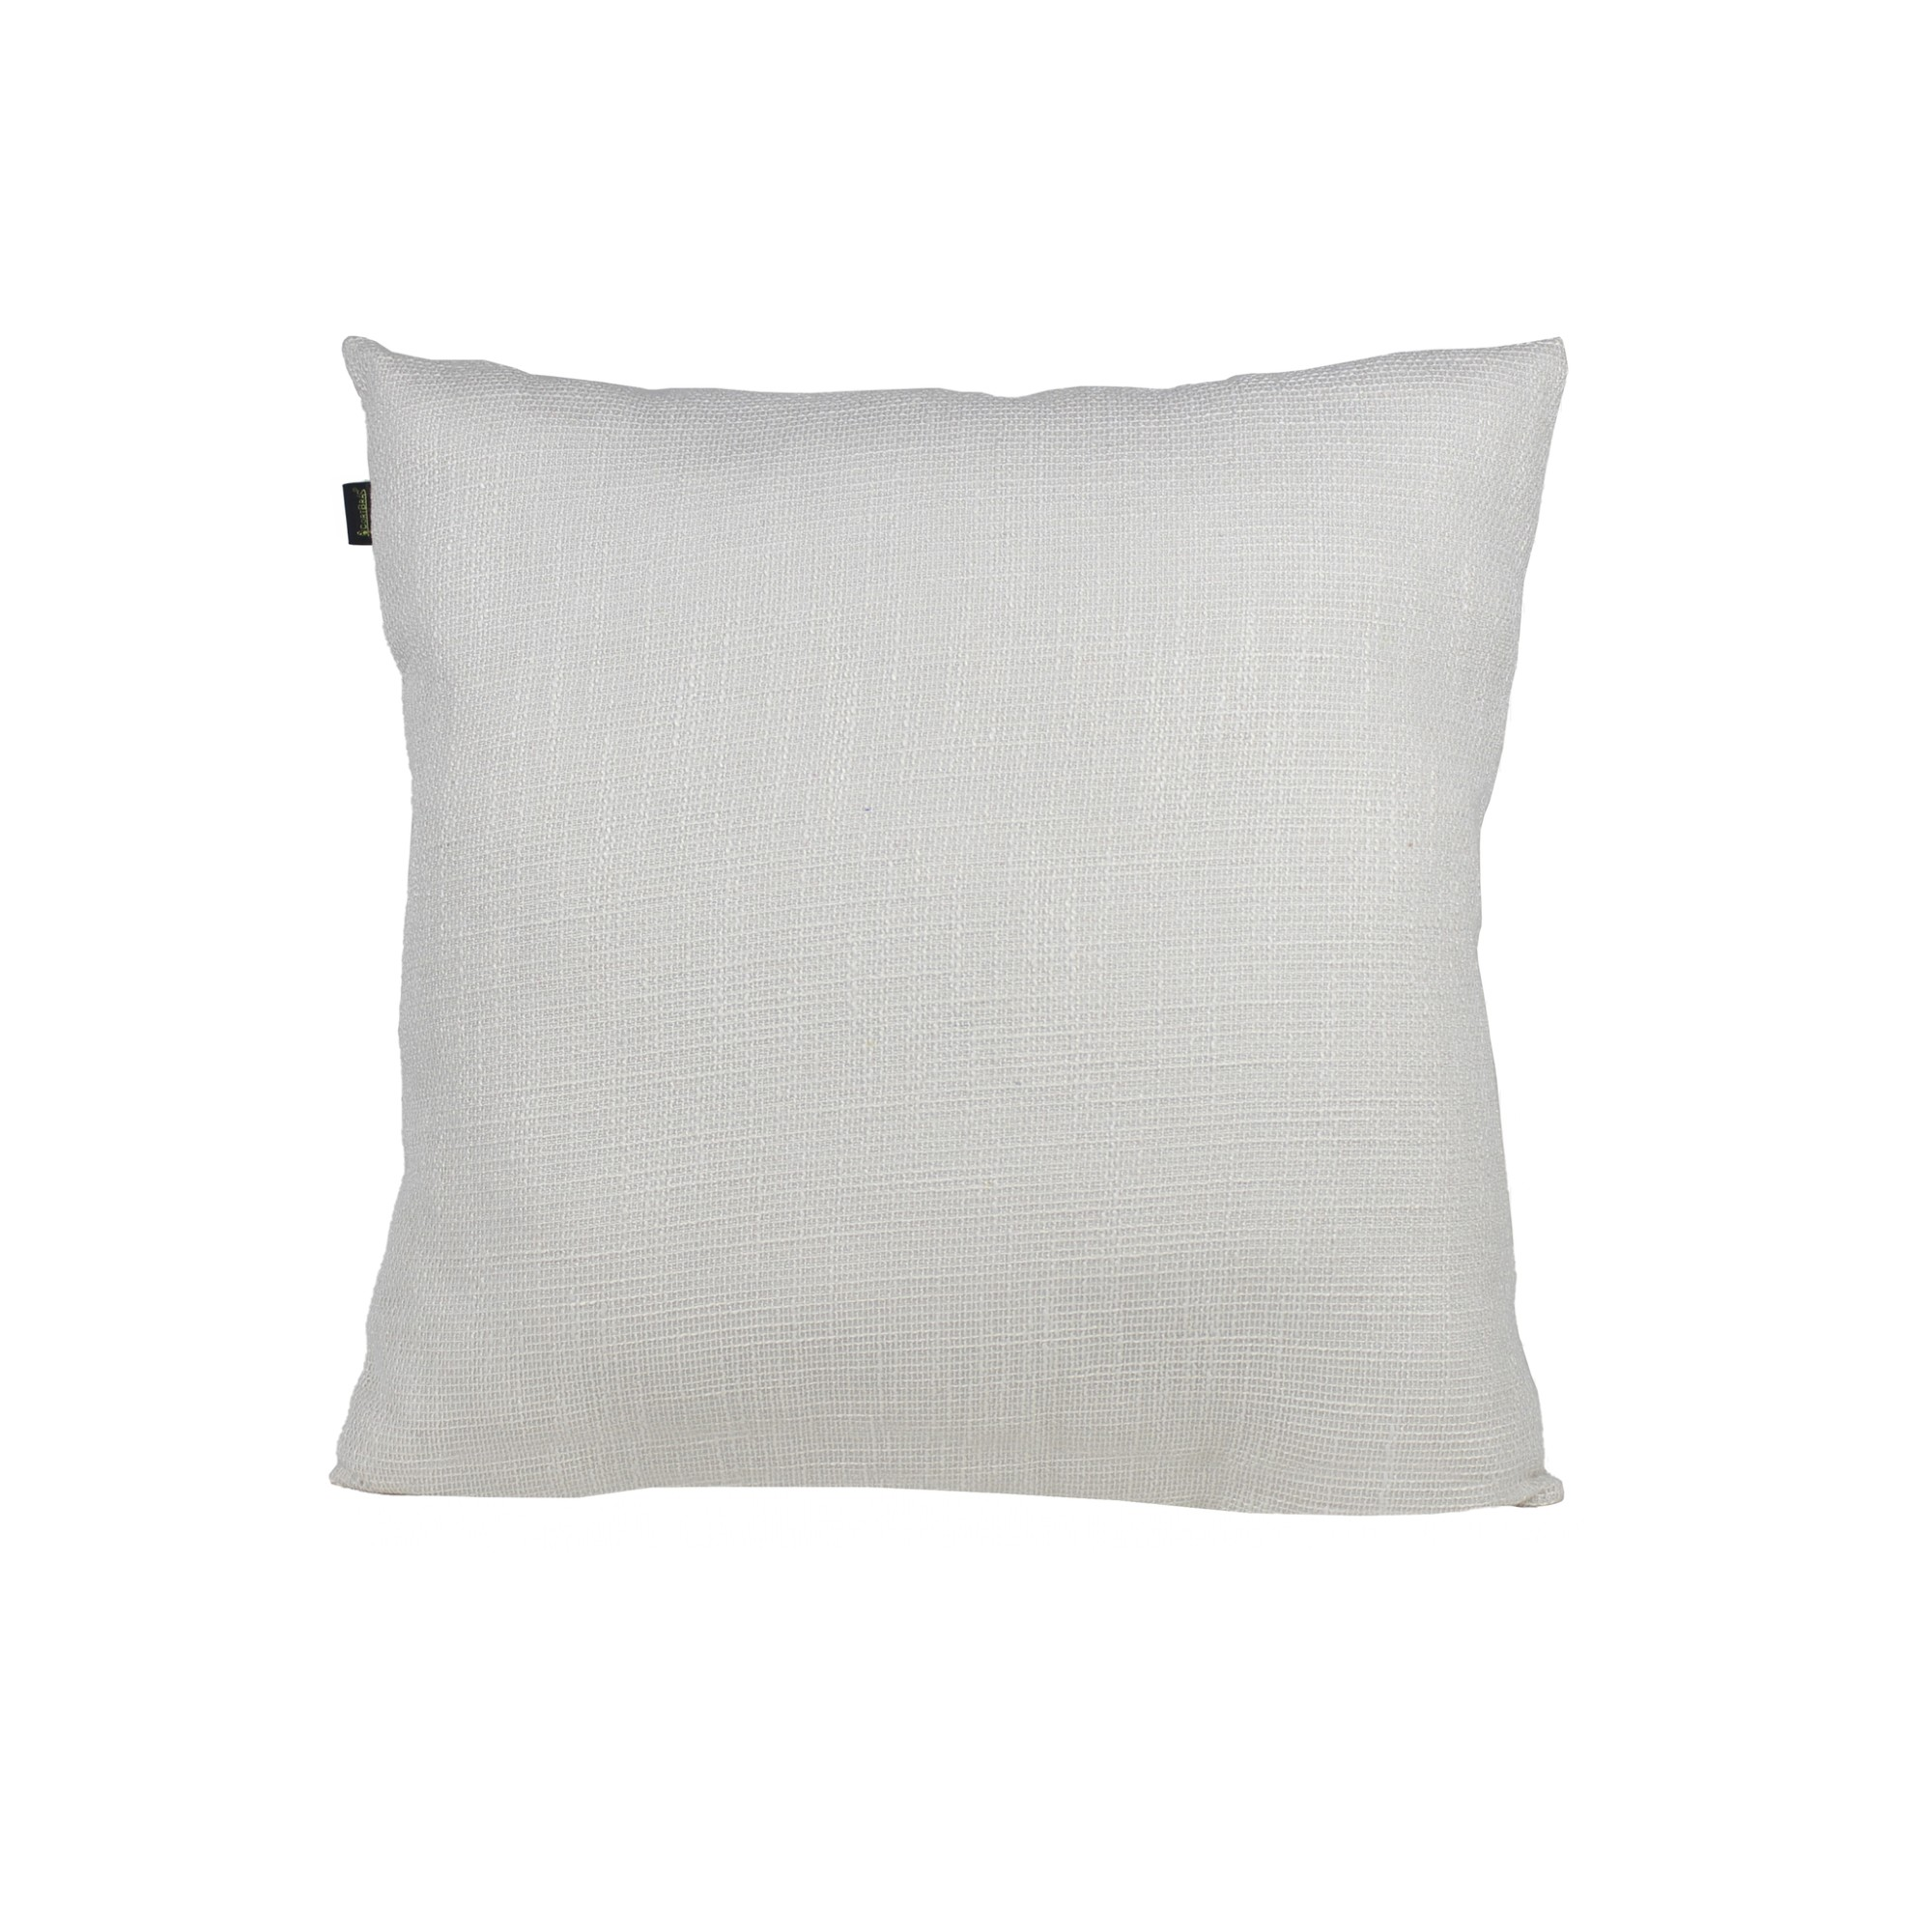 Almofada Colmeia 50x50cm Branco 502017 - Cortbras